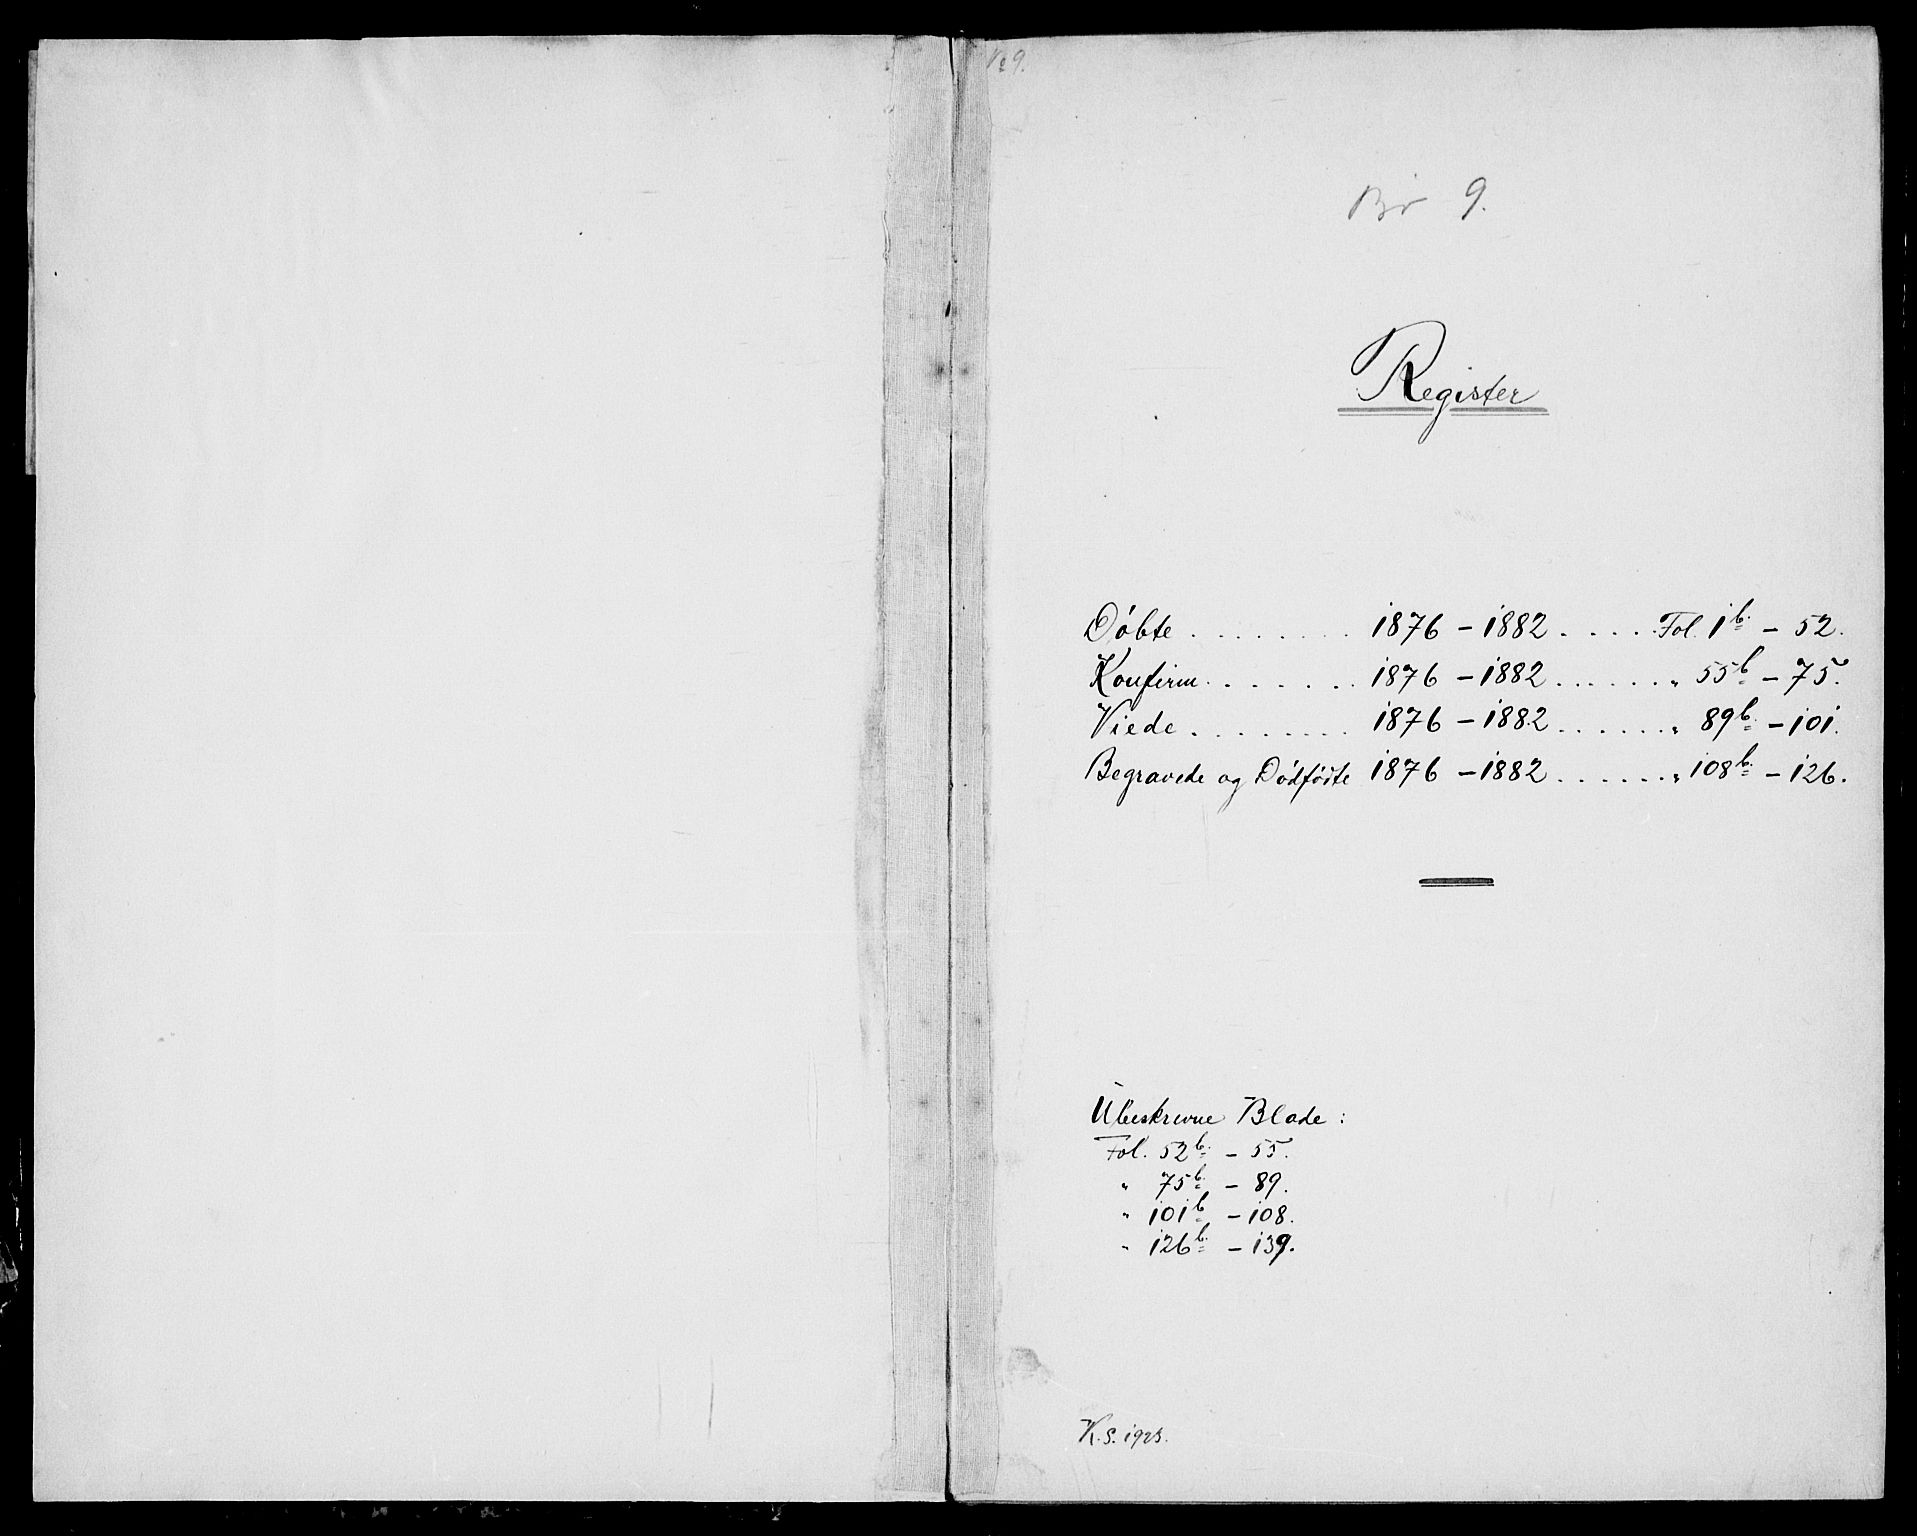 SAKO, Bø kirkebøker, G/Ga/L0004: Klokkerbok nr. 4, 1876-1882